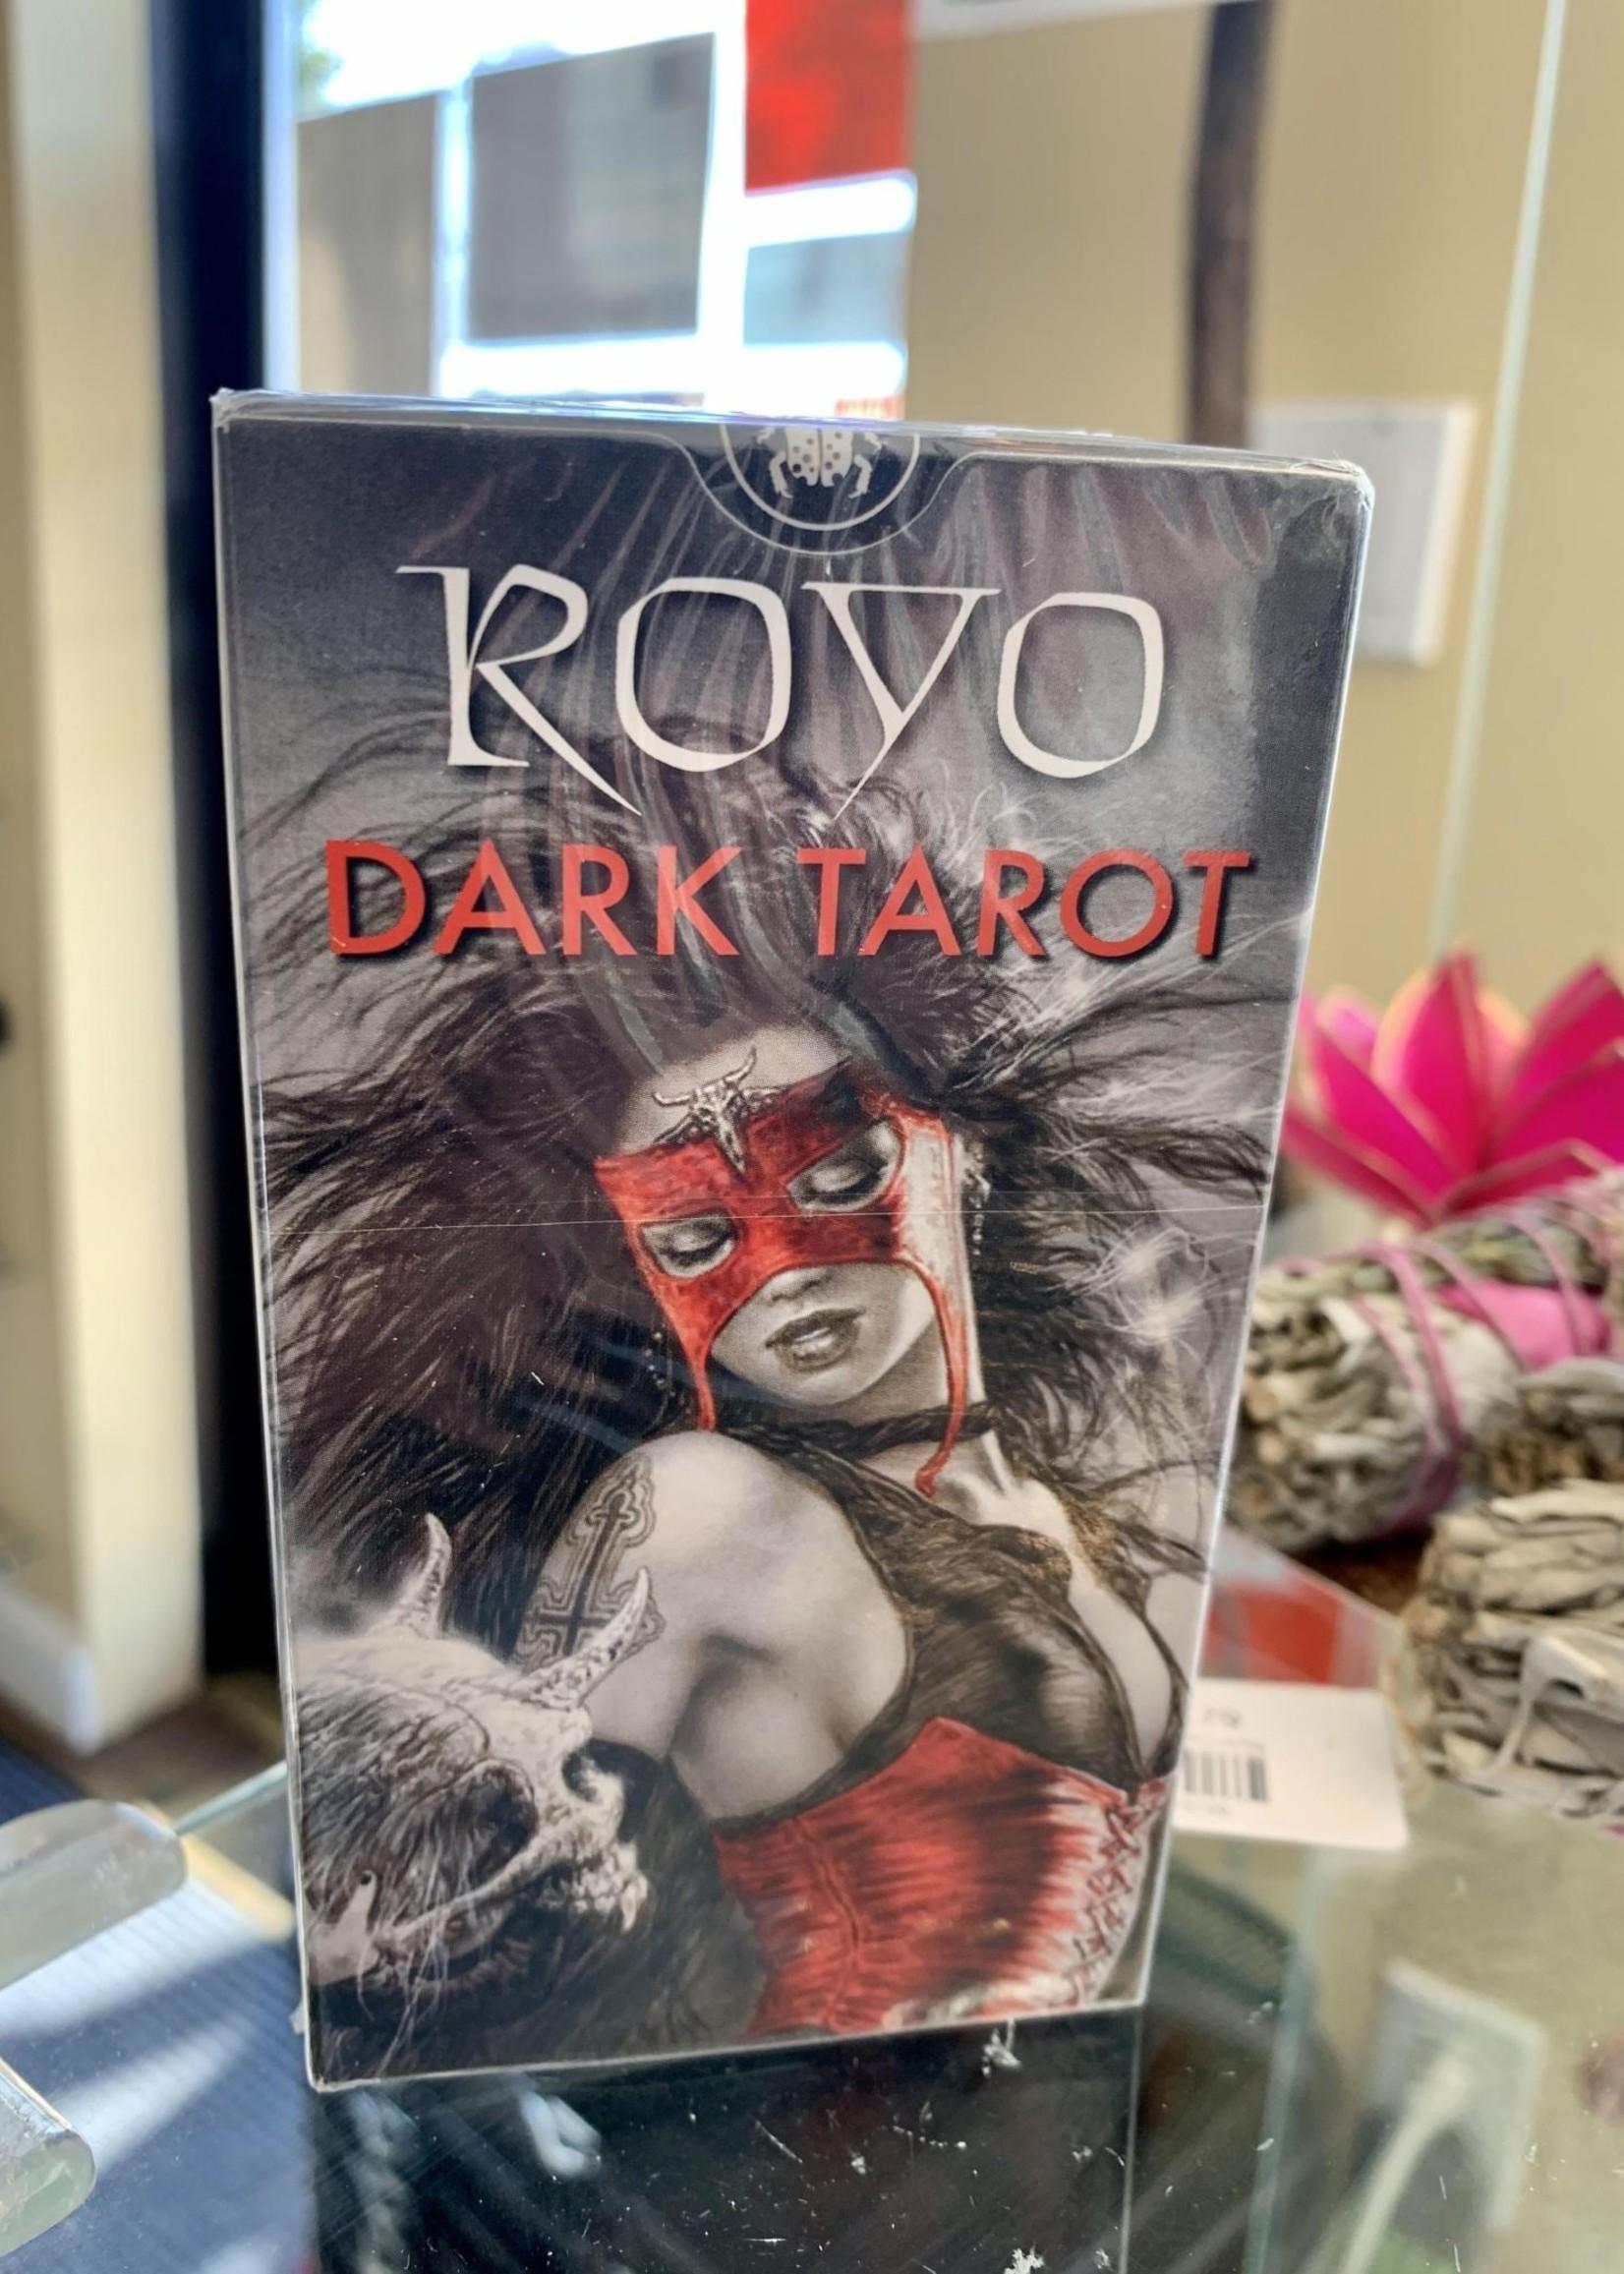 Royo Dark Tarot Deck